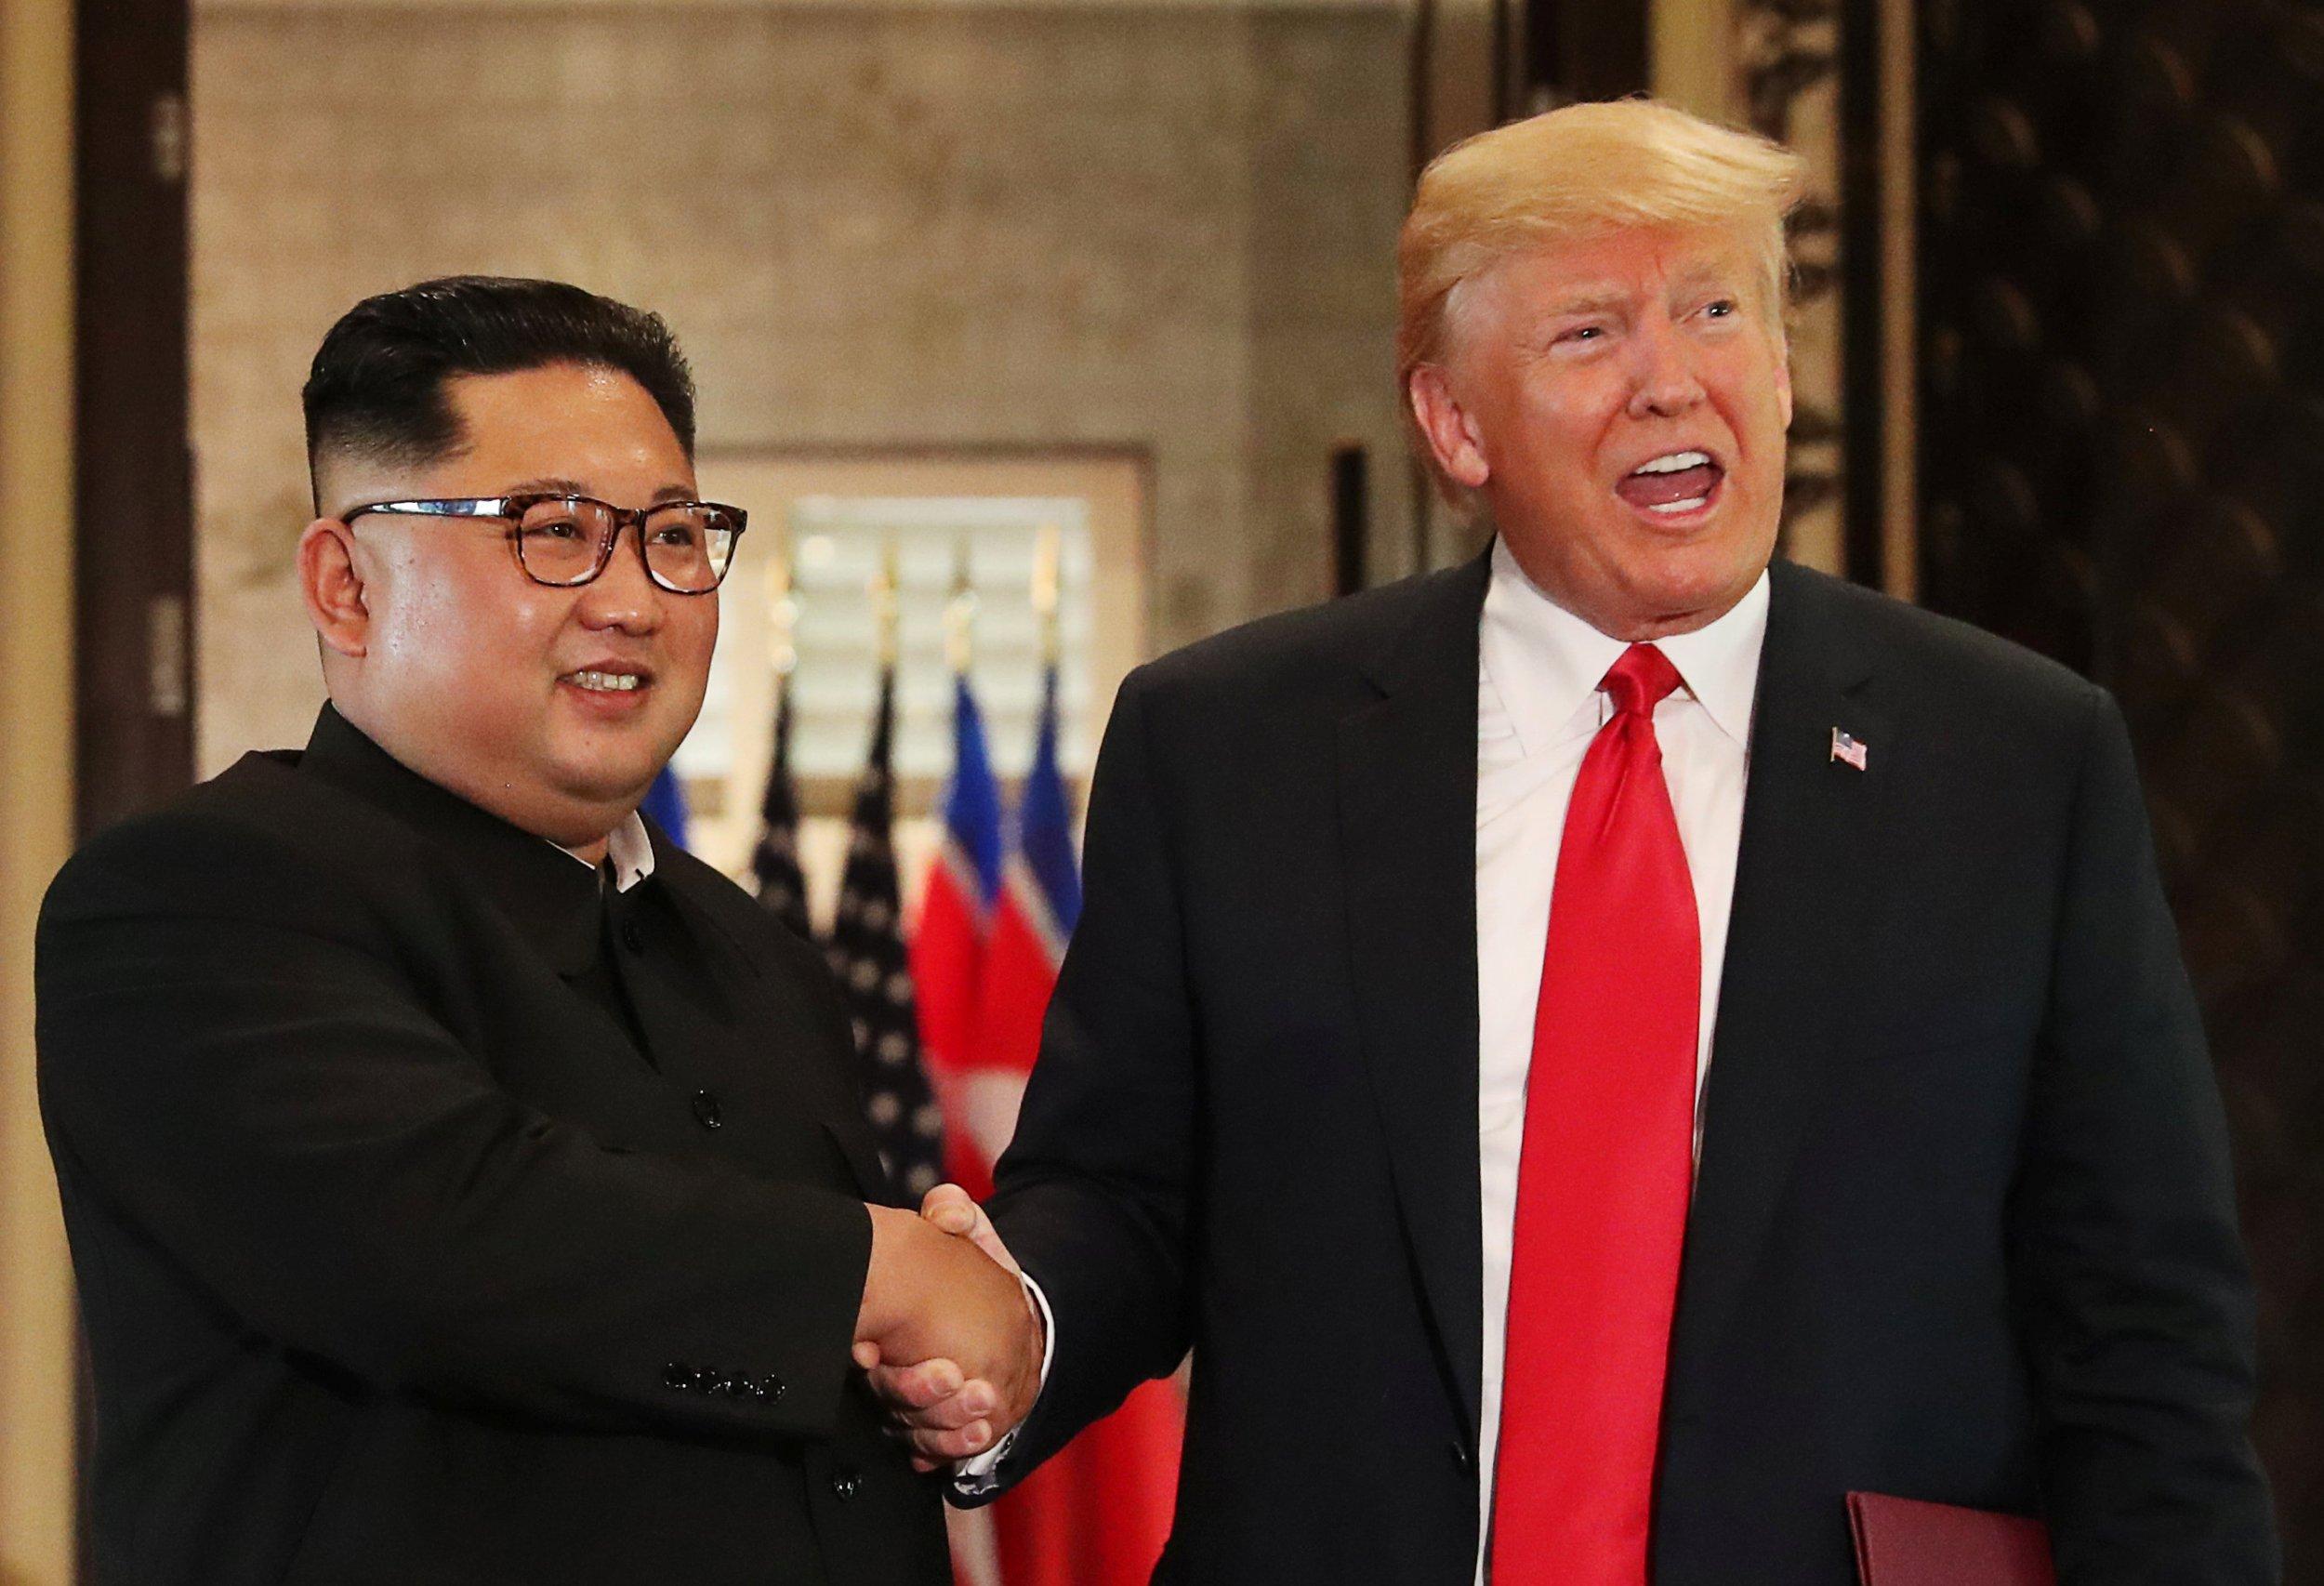 2018-06-13T034516Z_1_LYNXMPEE5C06U_RTROPTP_4_NORTHKOREA-USA